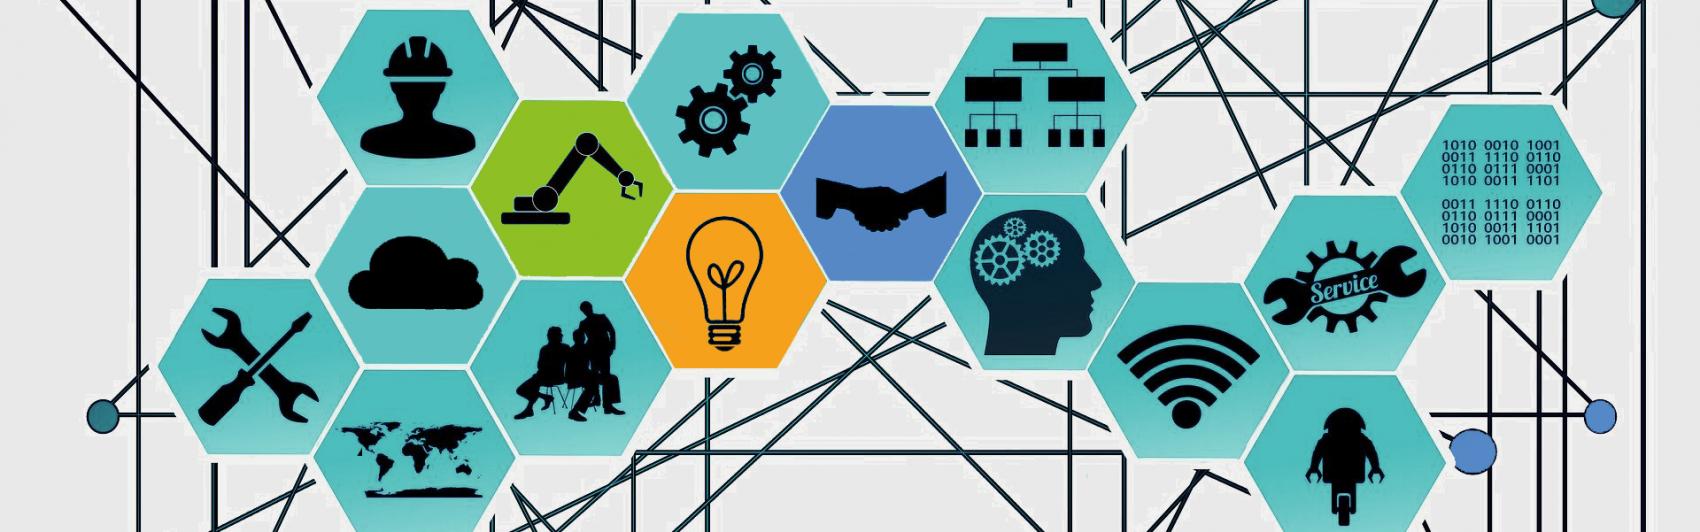 Industry; Innovation; Digitalisierung; Startups; Network